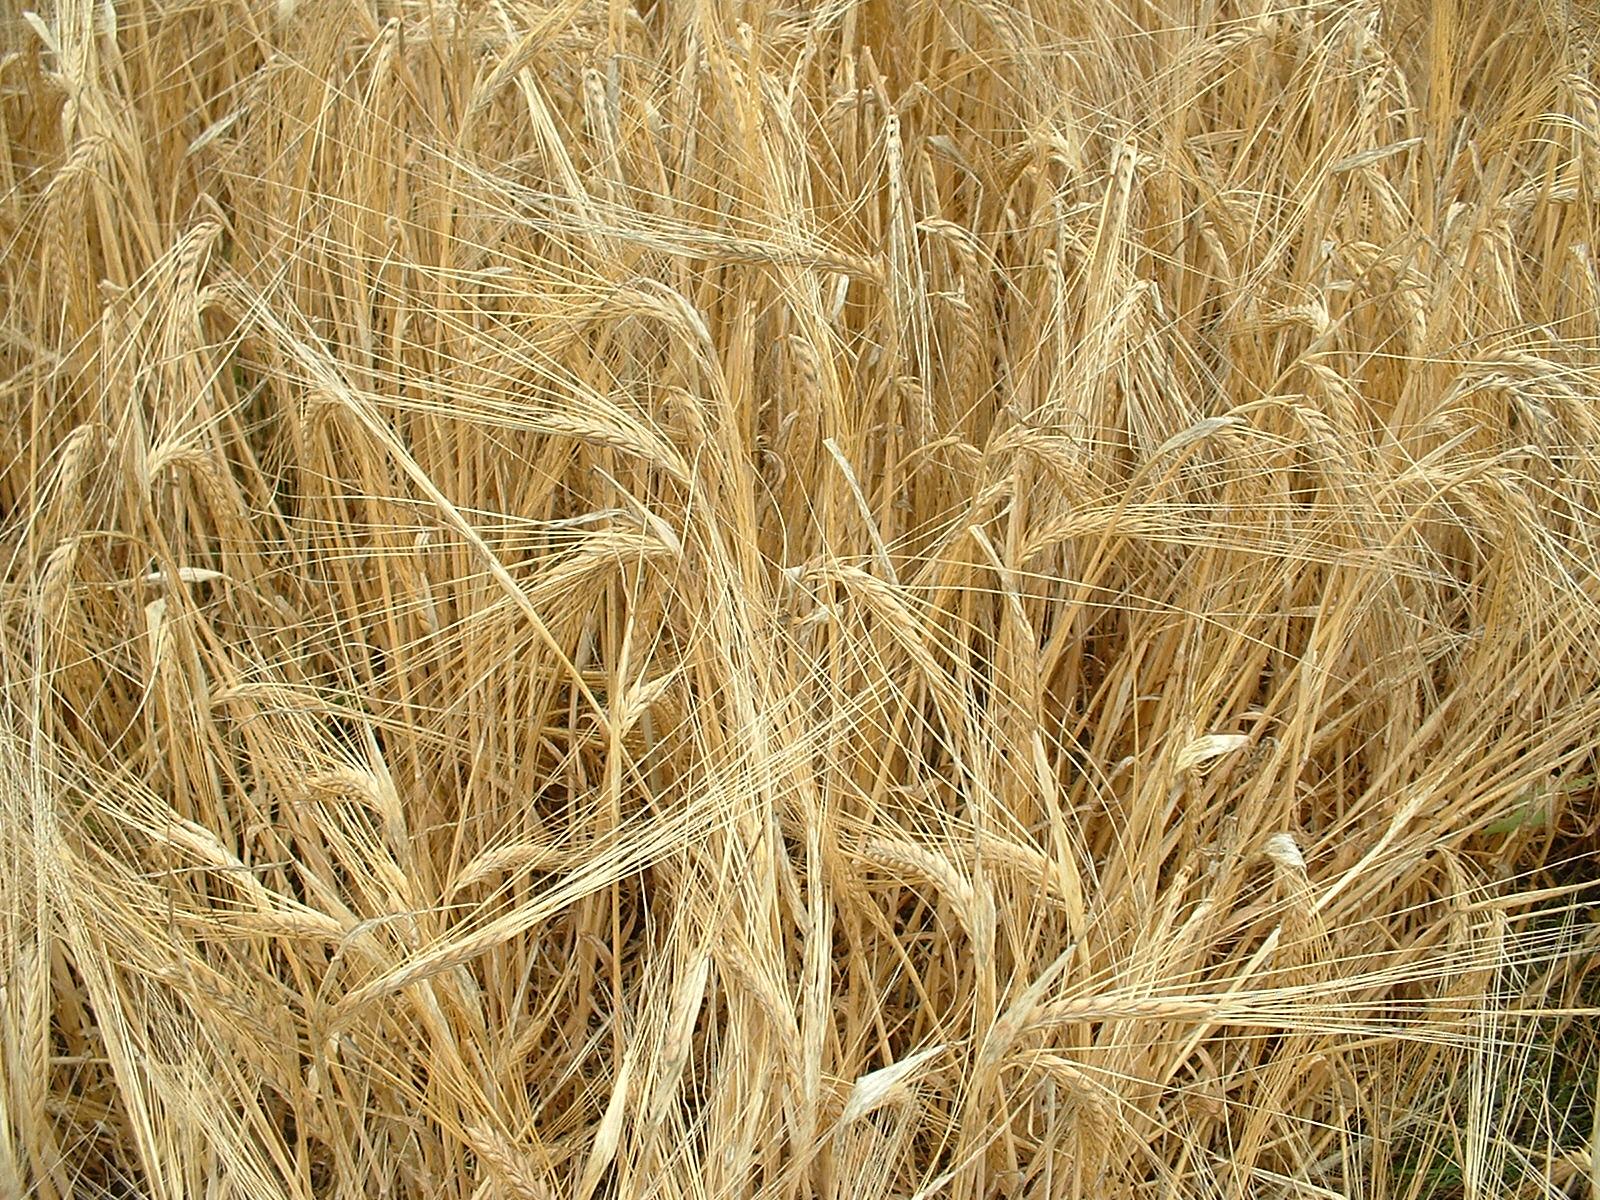 Connie Hunter Urban The New Year The Barley Harvest Spirit Fuel